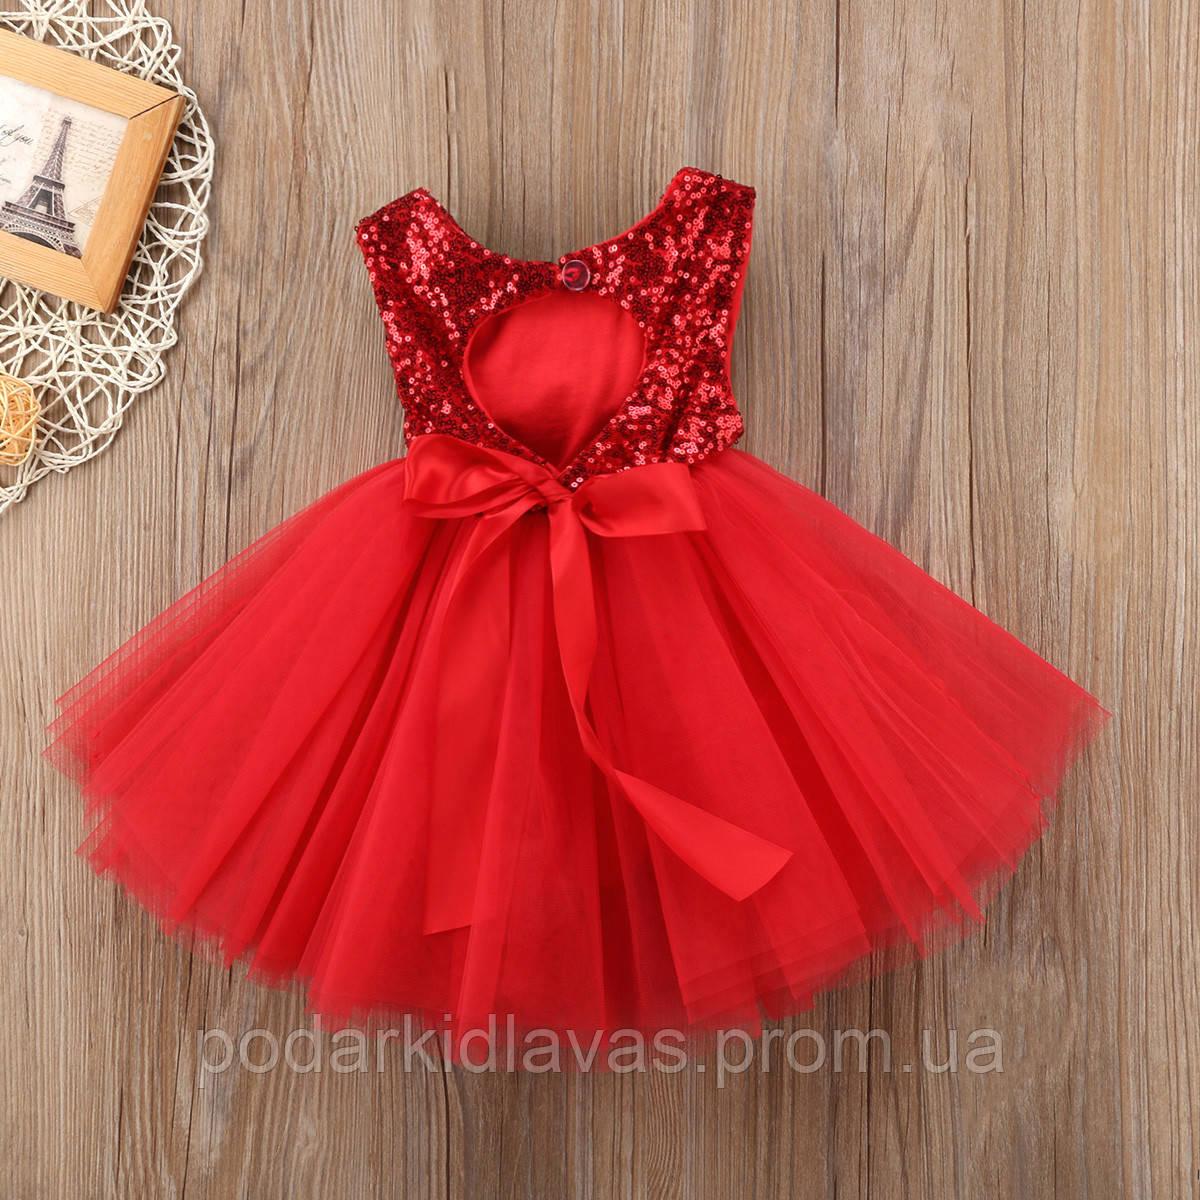 e022028b4b53e3e Платье на малышку пышное с пайетками Красное - Present SHOP Новинки сезона.  Модные штучки.